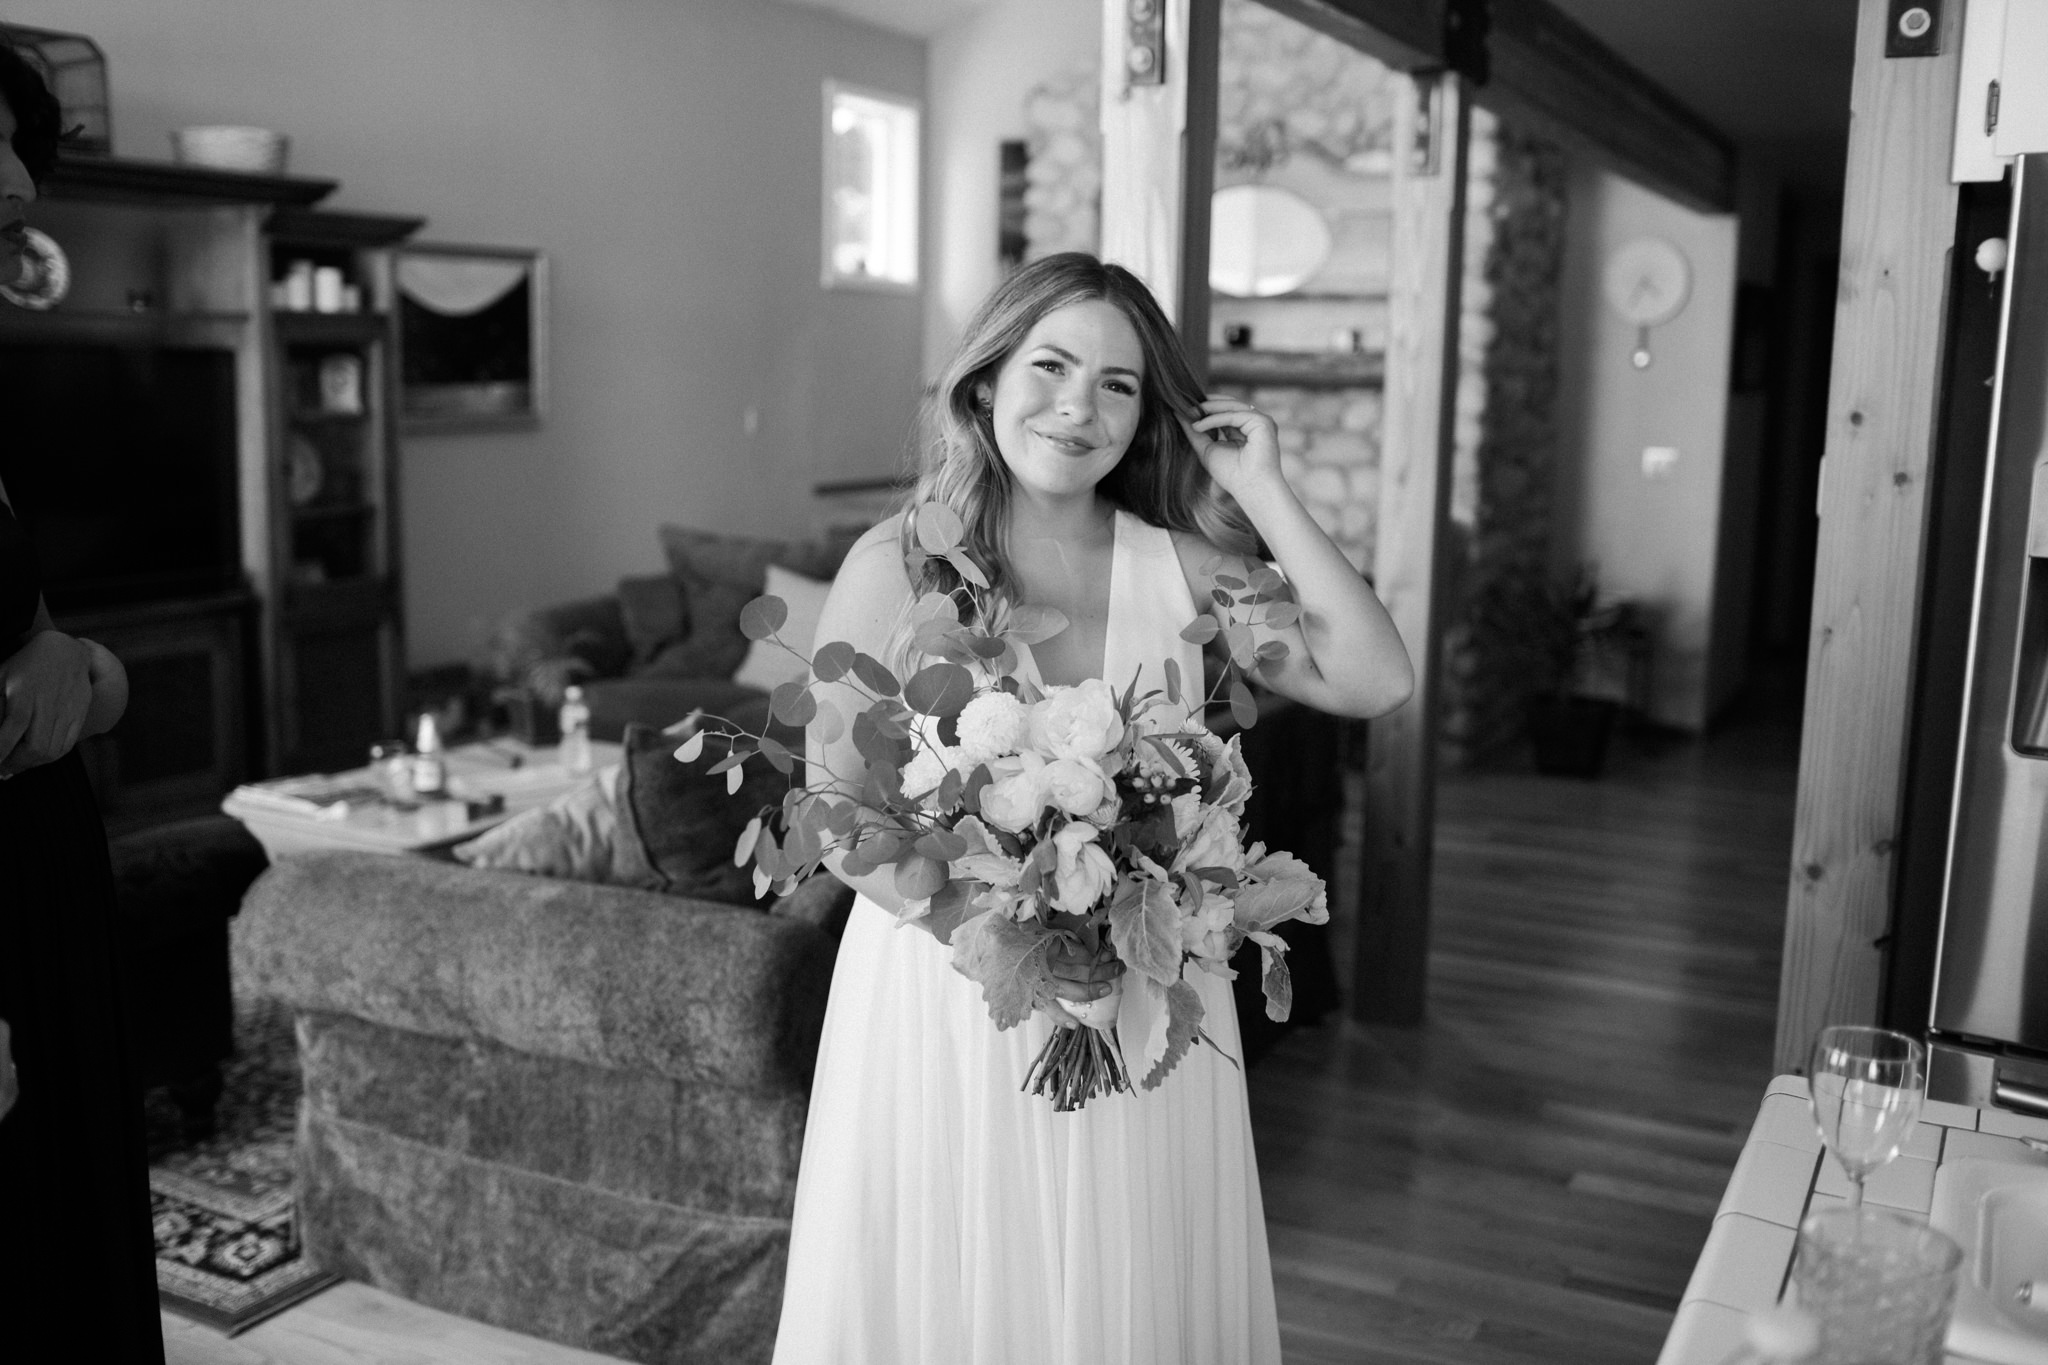 Backyard-Bainbridge-Island-Wedding-Alycia-Lovell-Photography-69.JPG